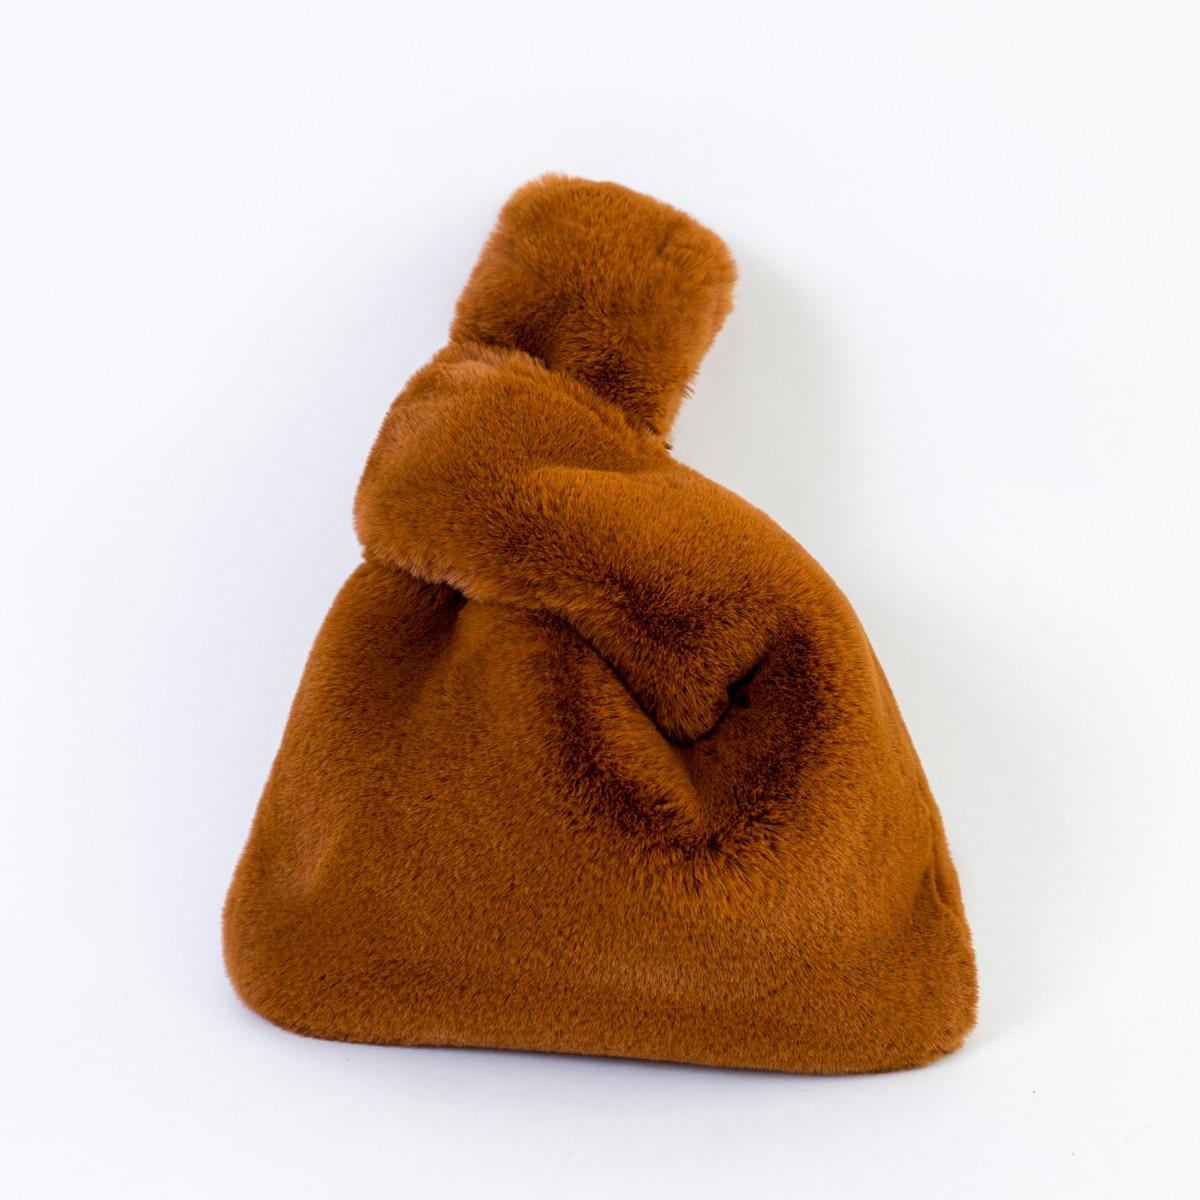 Super Soft Faux Rabbit Fur Handbag Leopard Fur Handbag Cute Vest Shape Handbag Crossover Chain Fur Drawstring Bags Shopping Bags